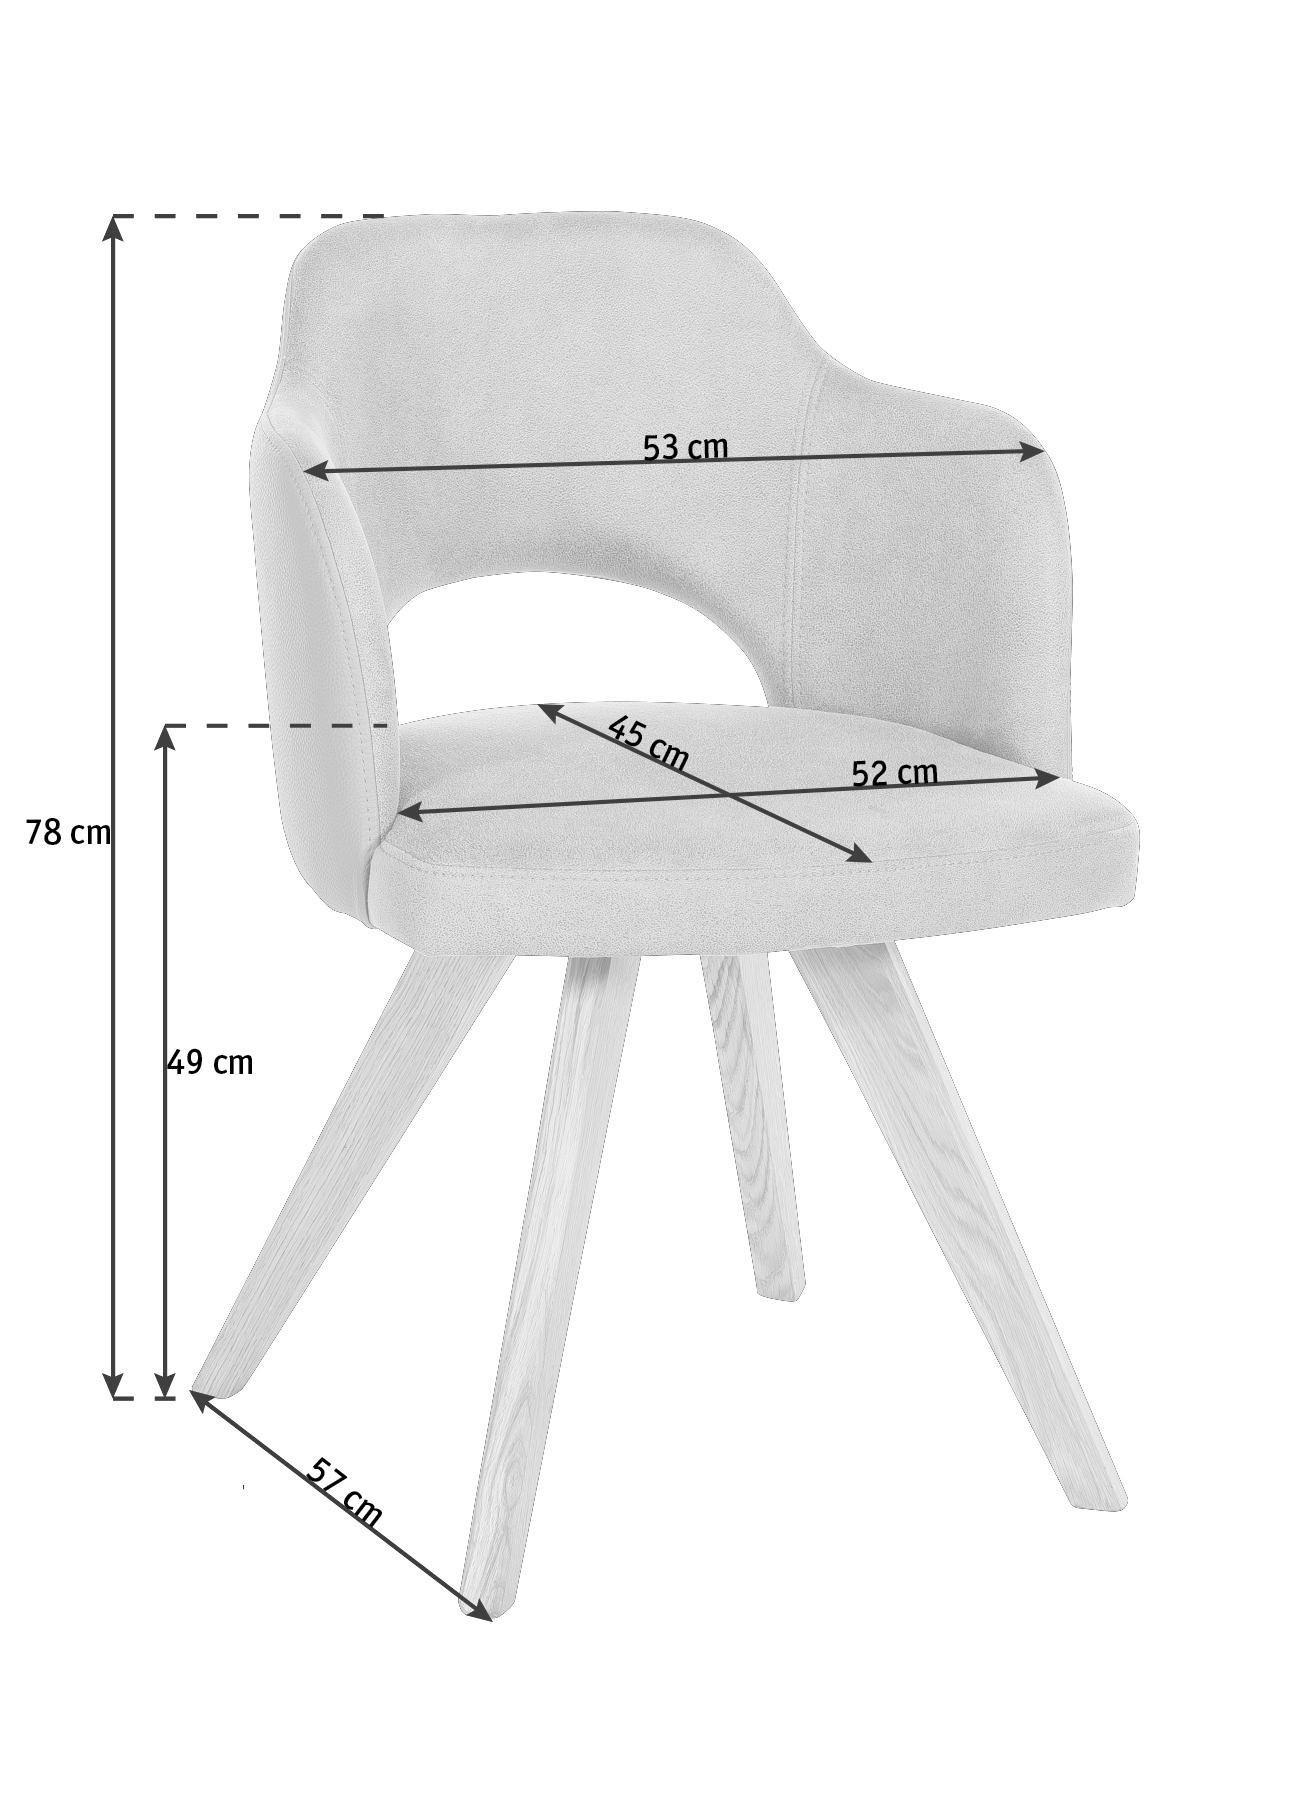 STUHL in Holz, Textil Eichefarben, Taupe - Taupe/Eichefarben, KONVENTIONELL, Holz/Textil (53/78/57cm) - VOLEO